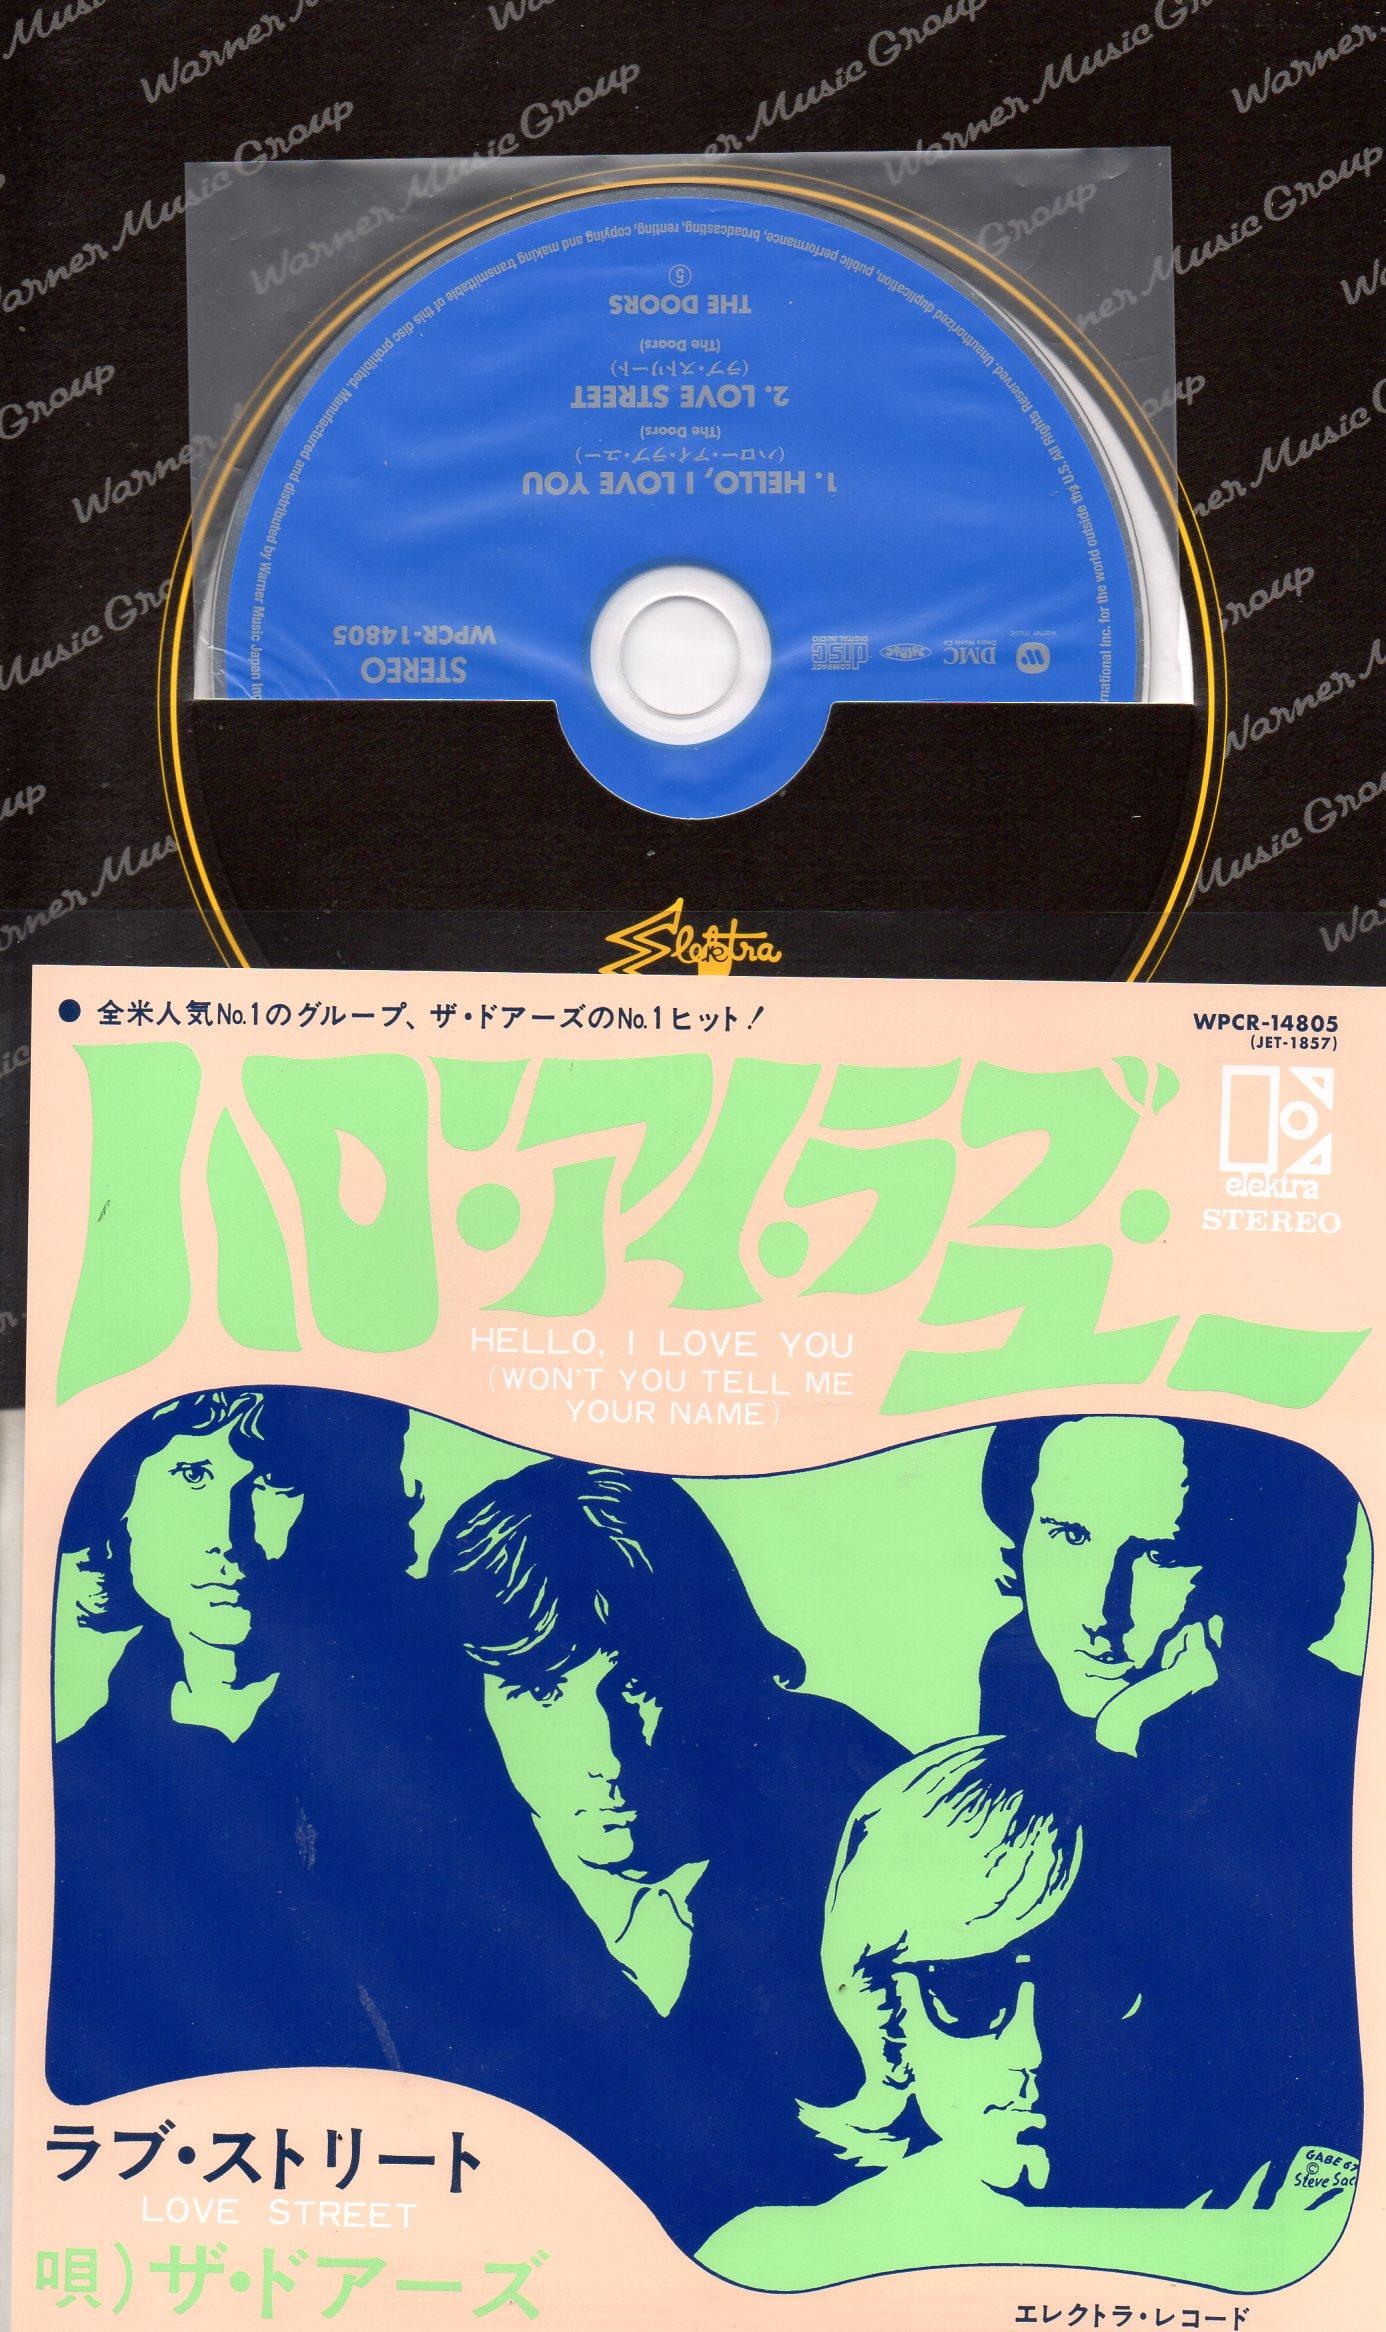 THE DOORS - The Doors - The end 11-TRACK + 3 BONUS TRACKS - CD